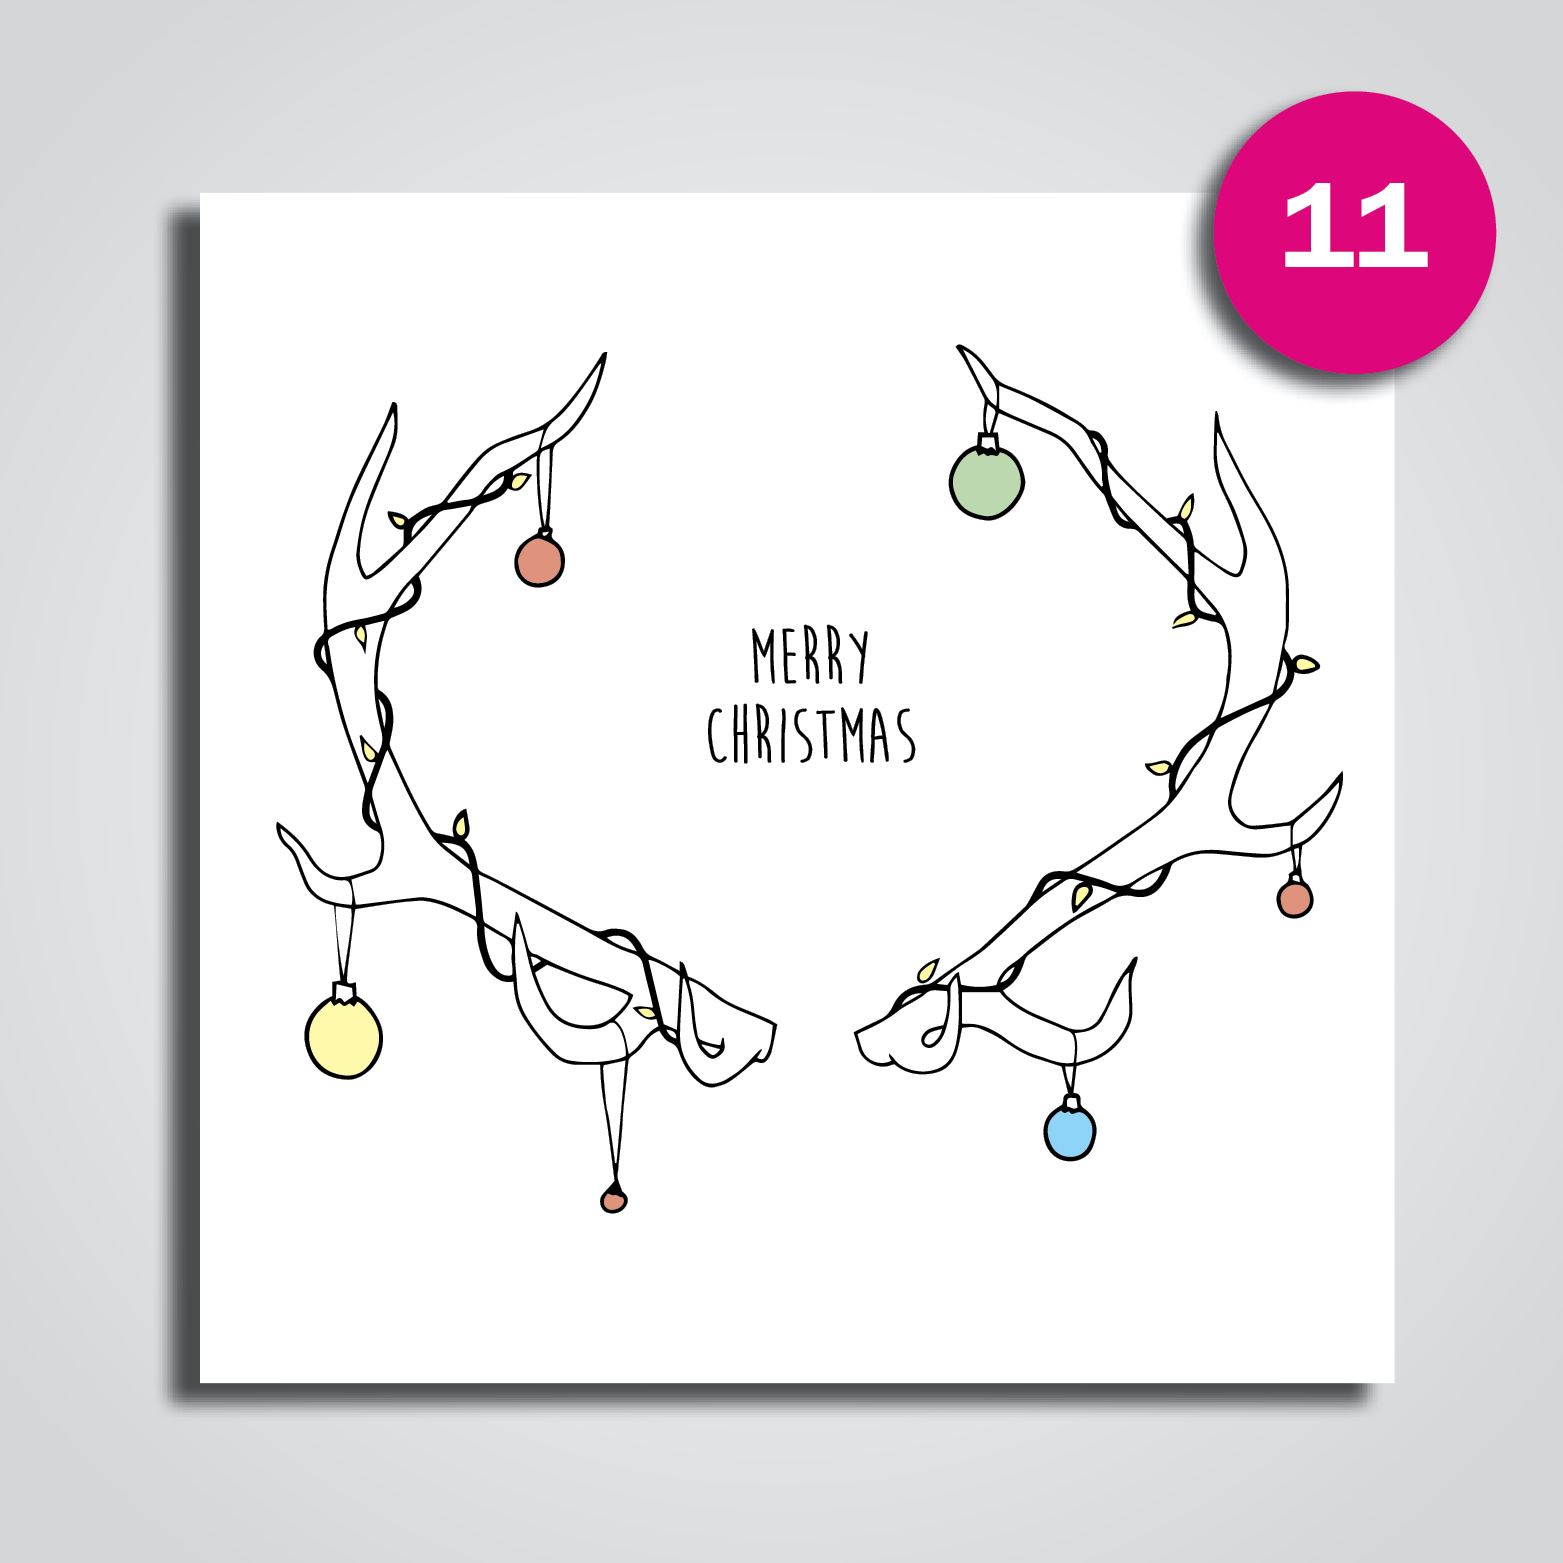 Christmas Card Designs - Telford Reprographics Ltd